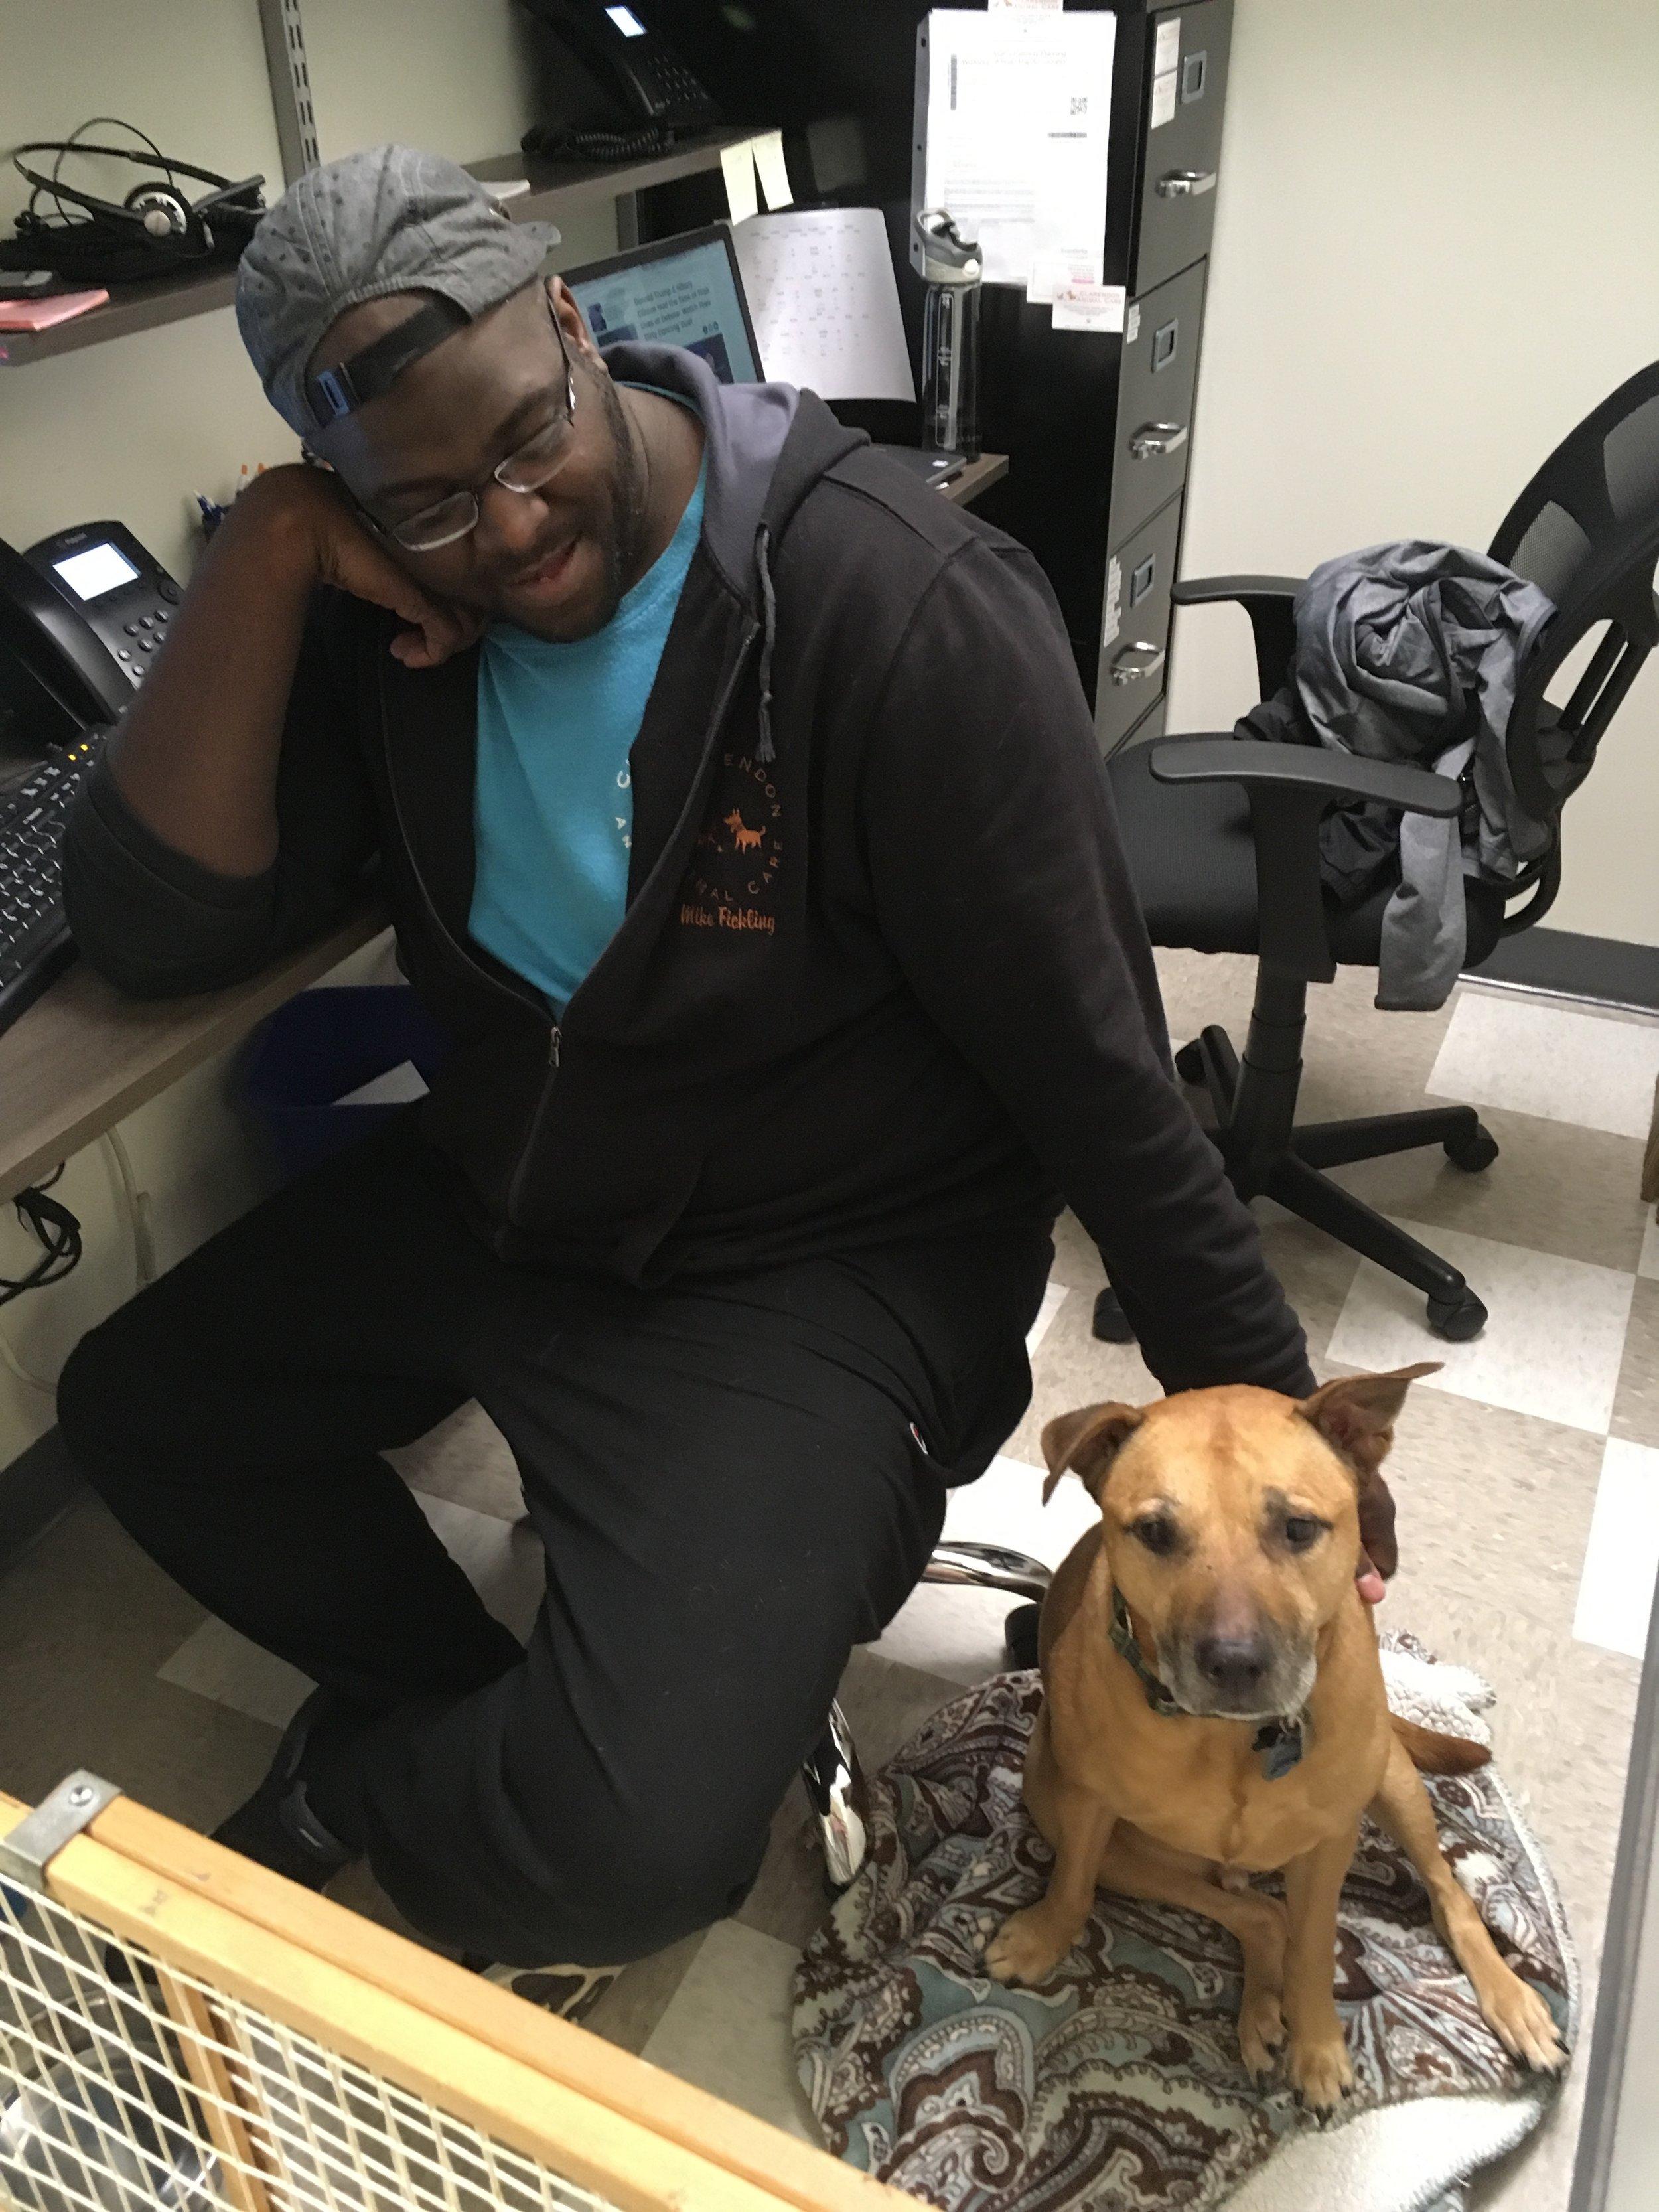 Clarendon Animal Care Veterinary Clinic Arlington Virginia Staff with a Dog